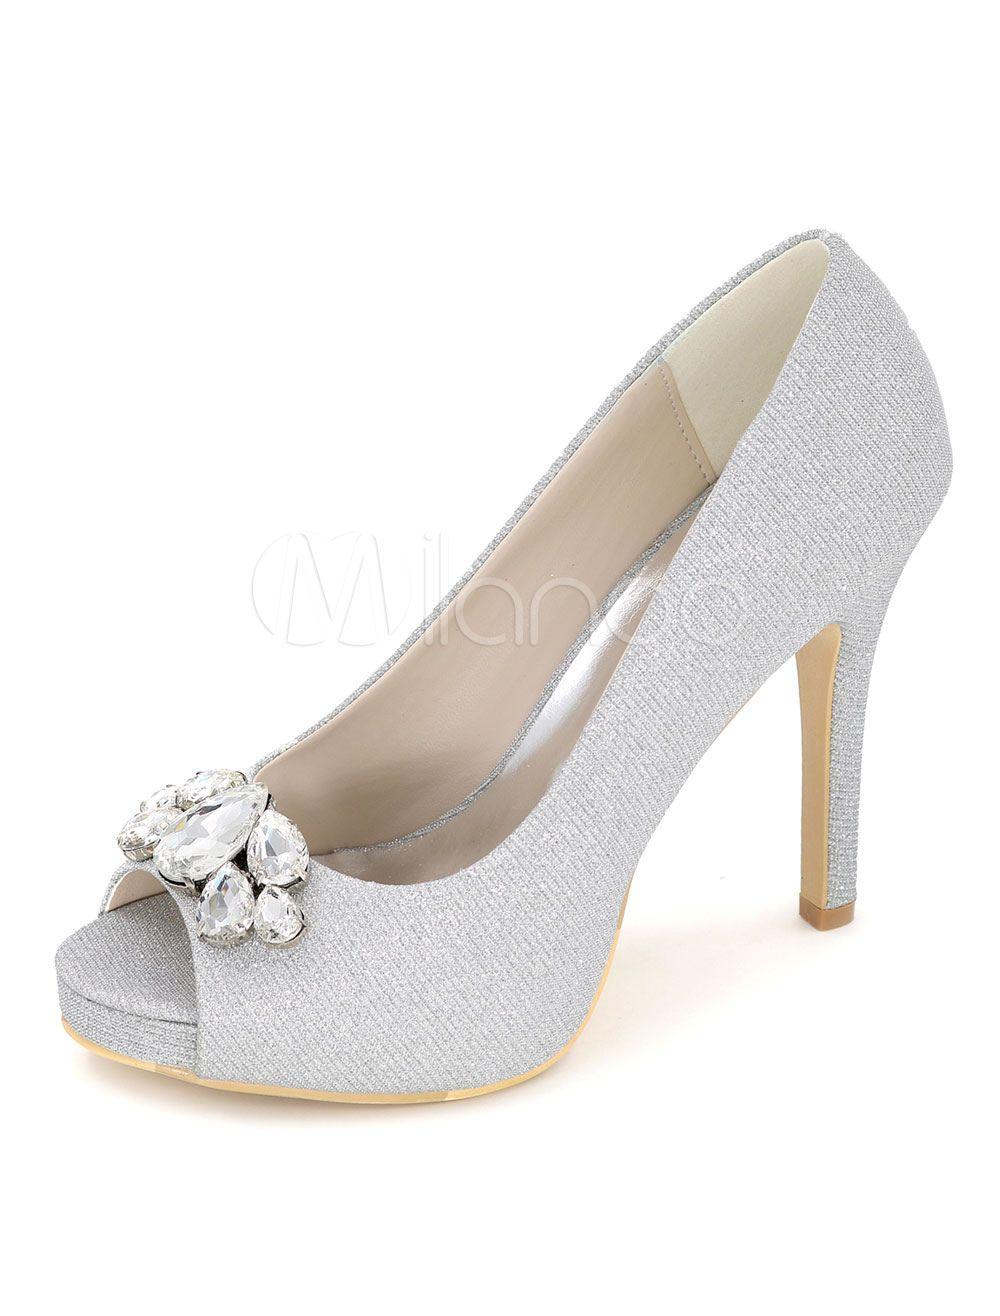 Blue Peep Toe Wedding Shoes Glitter Platform Crystal Pumps Women S Stiletto Heel Bridal Shoes